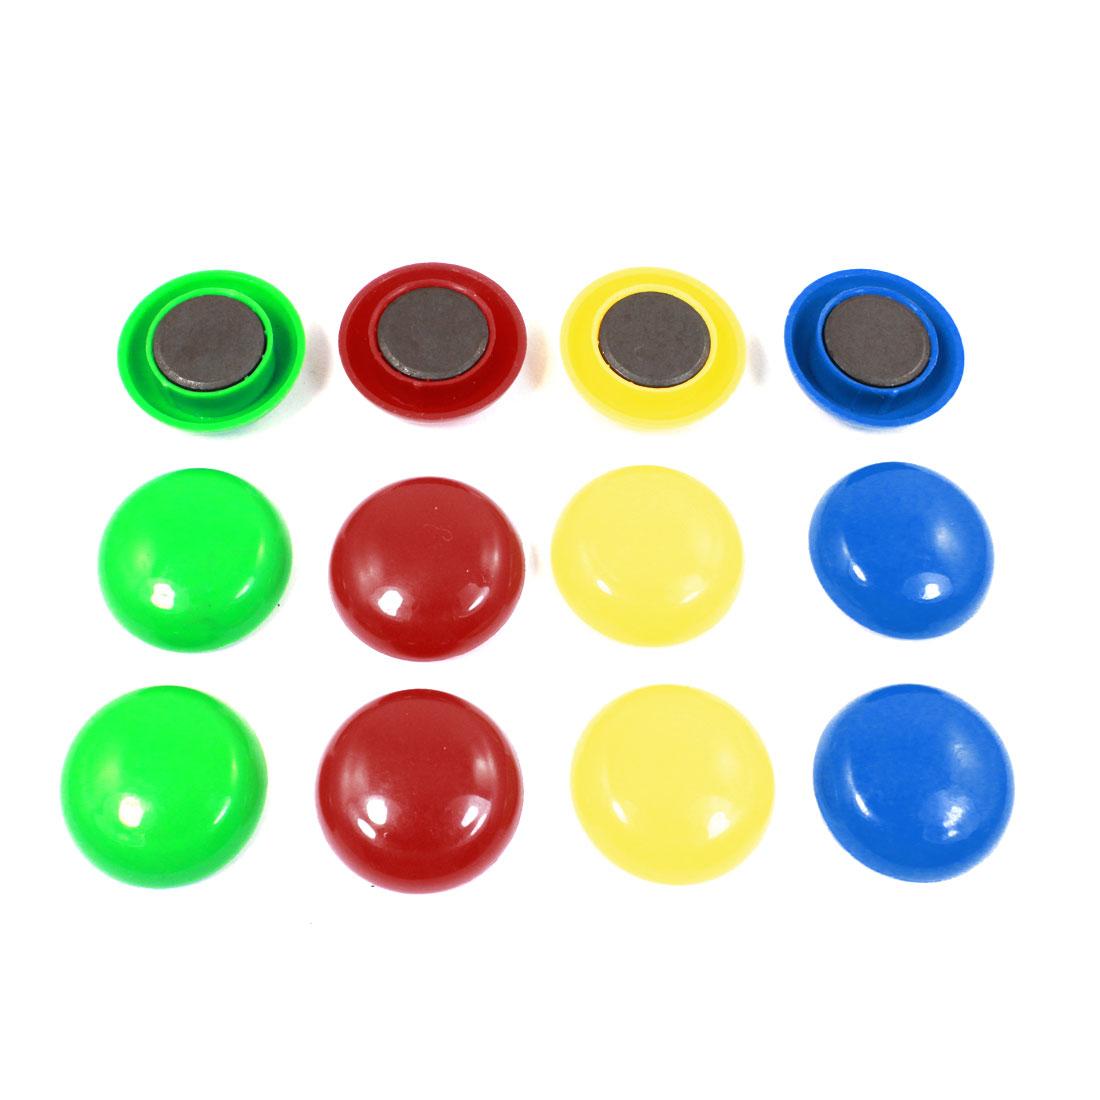 12 Pcs Multicolor Plastic 3cm Dia Cover Washing Machine Fridge Magnets